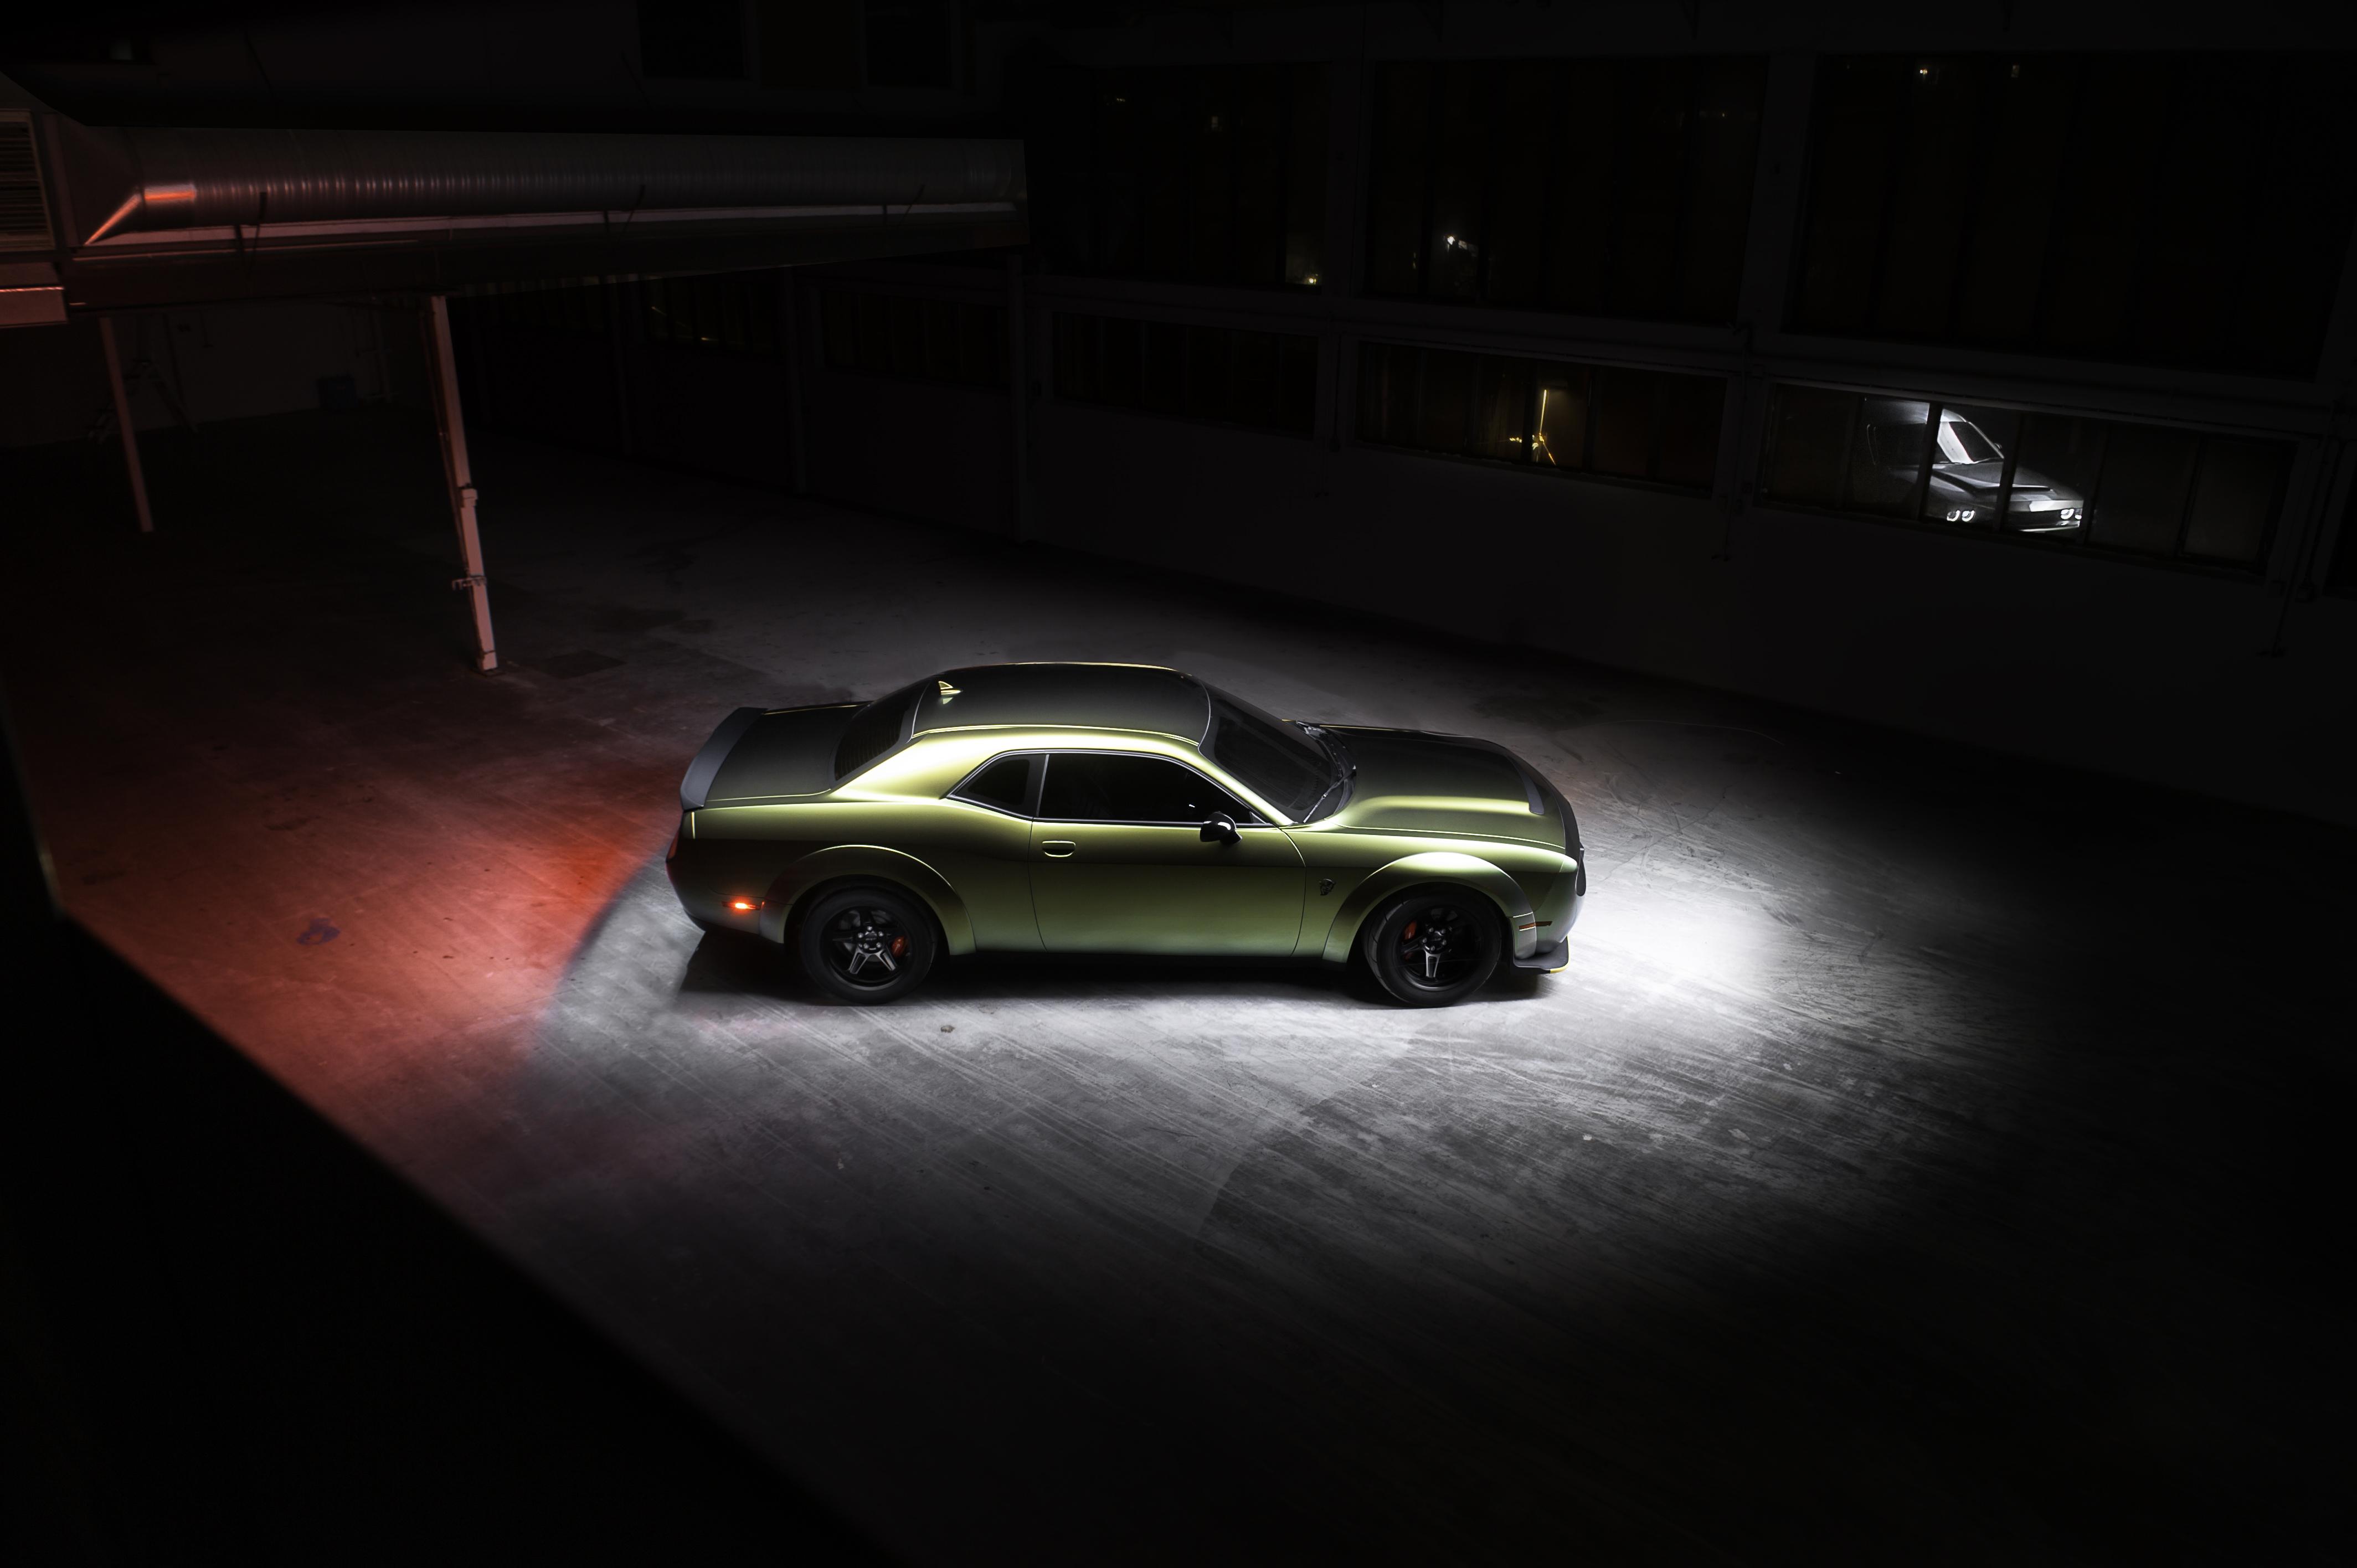 DEMONS BE DRIVEN - 2018 Dodge Challenger Demon